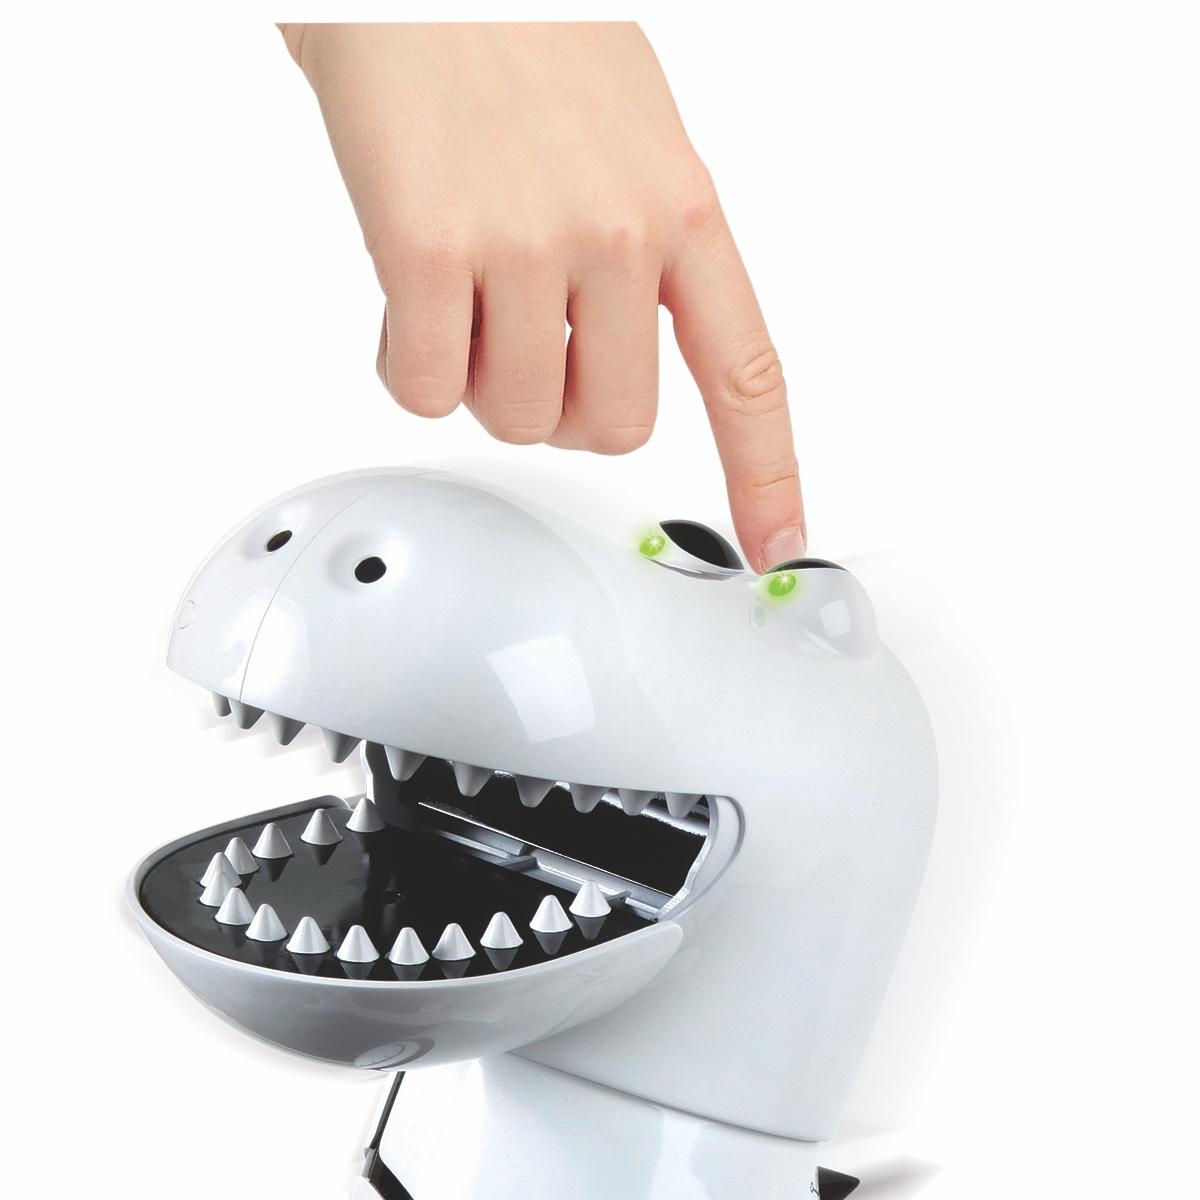 Fjernstyret Robot - Robotsaur Trainable